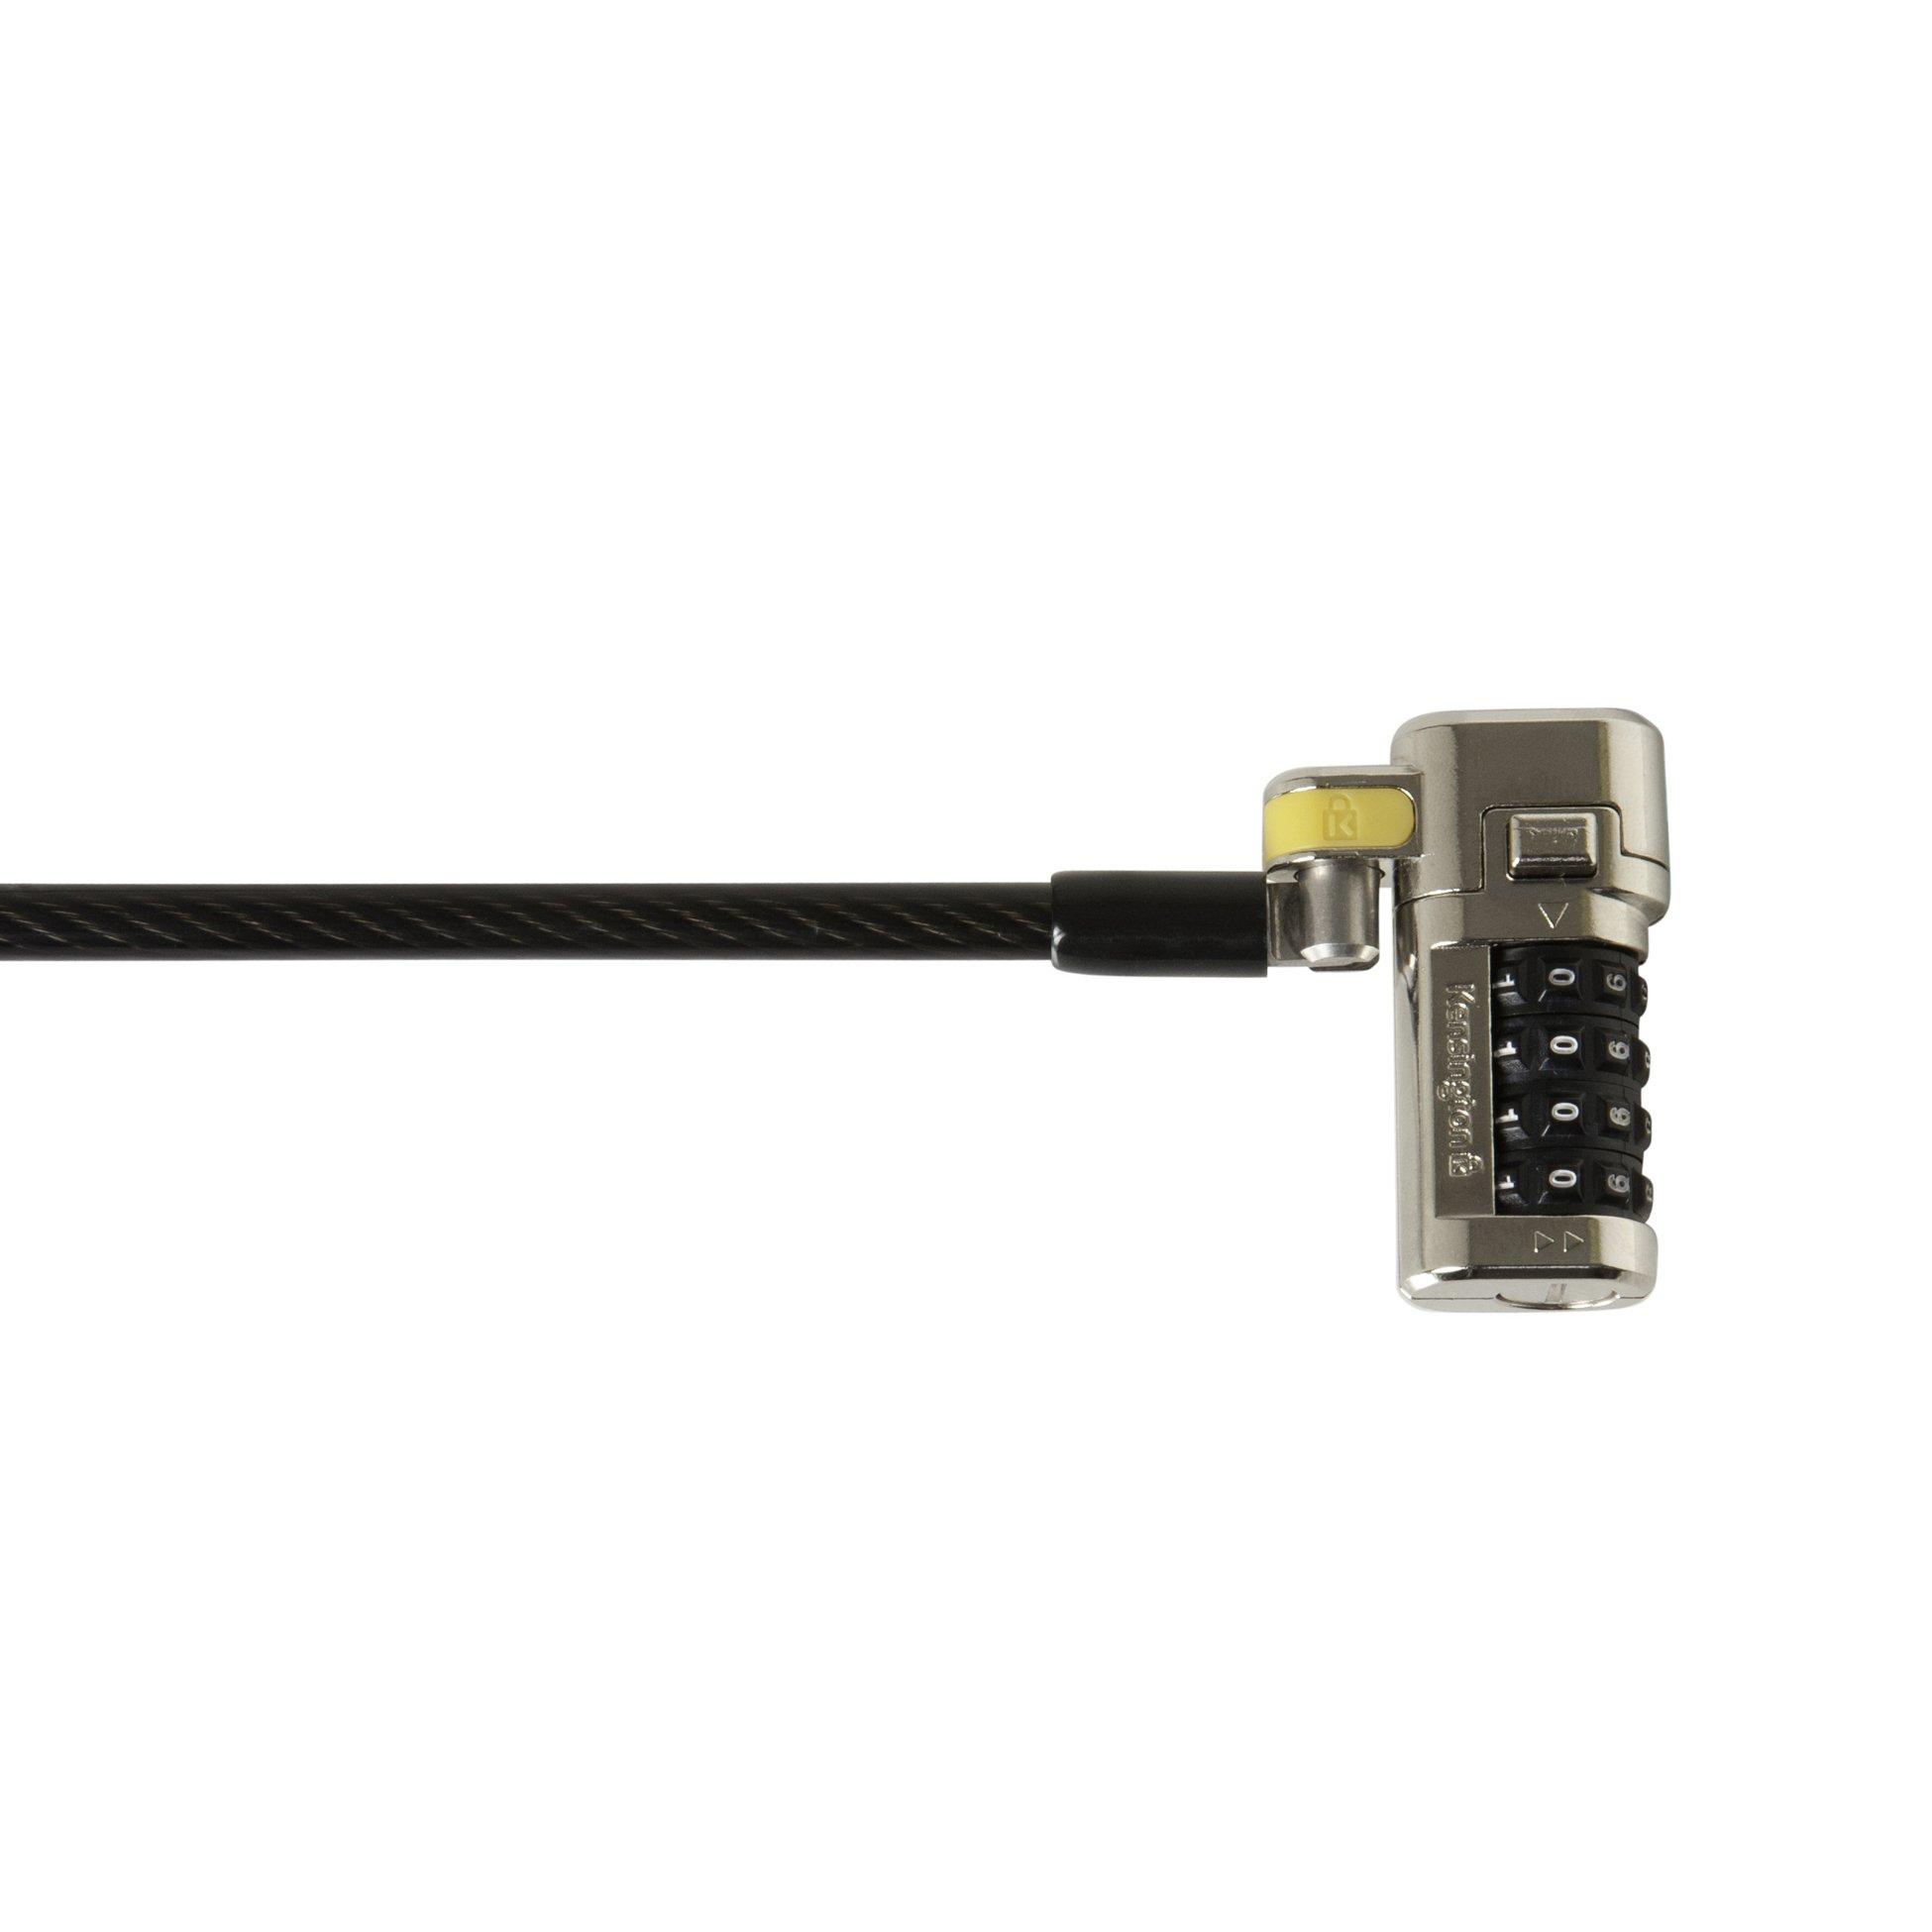 Kensington Clicksafe Master Coded Combination Ultra Laptop Lock (K64681US)